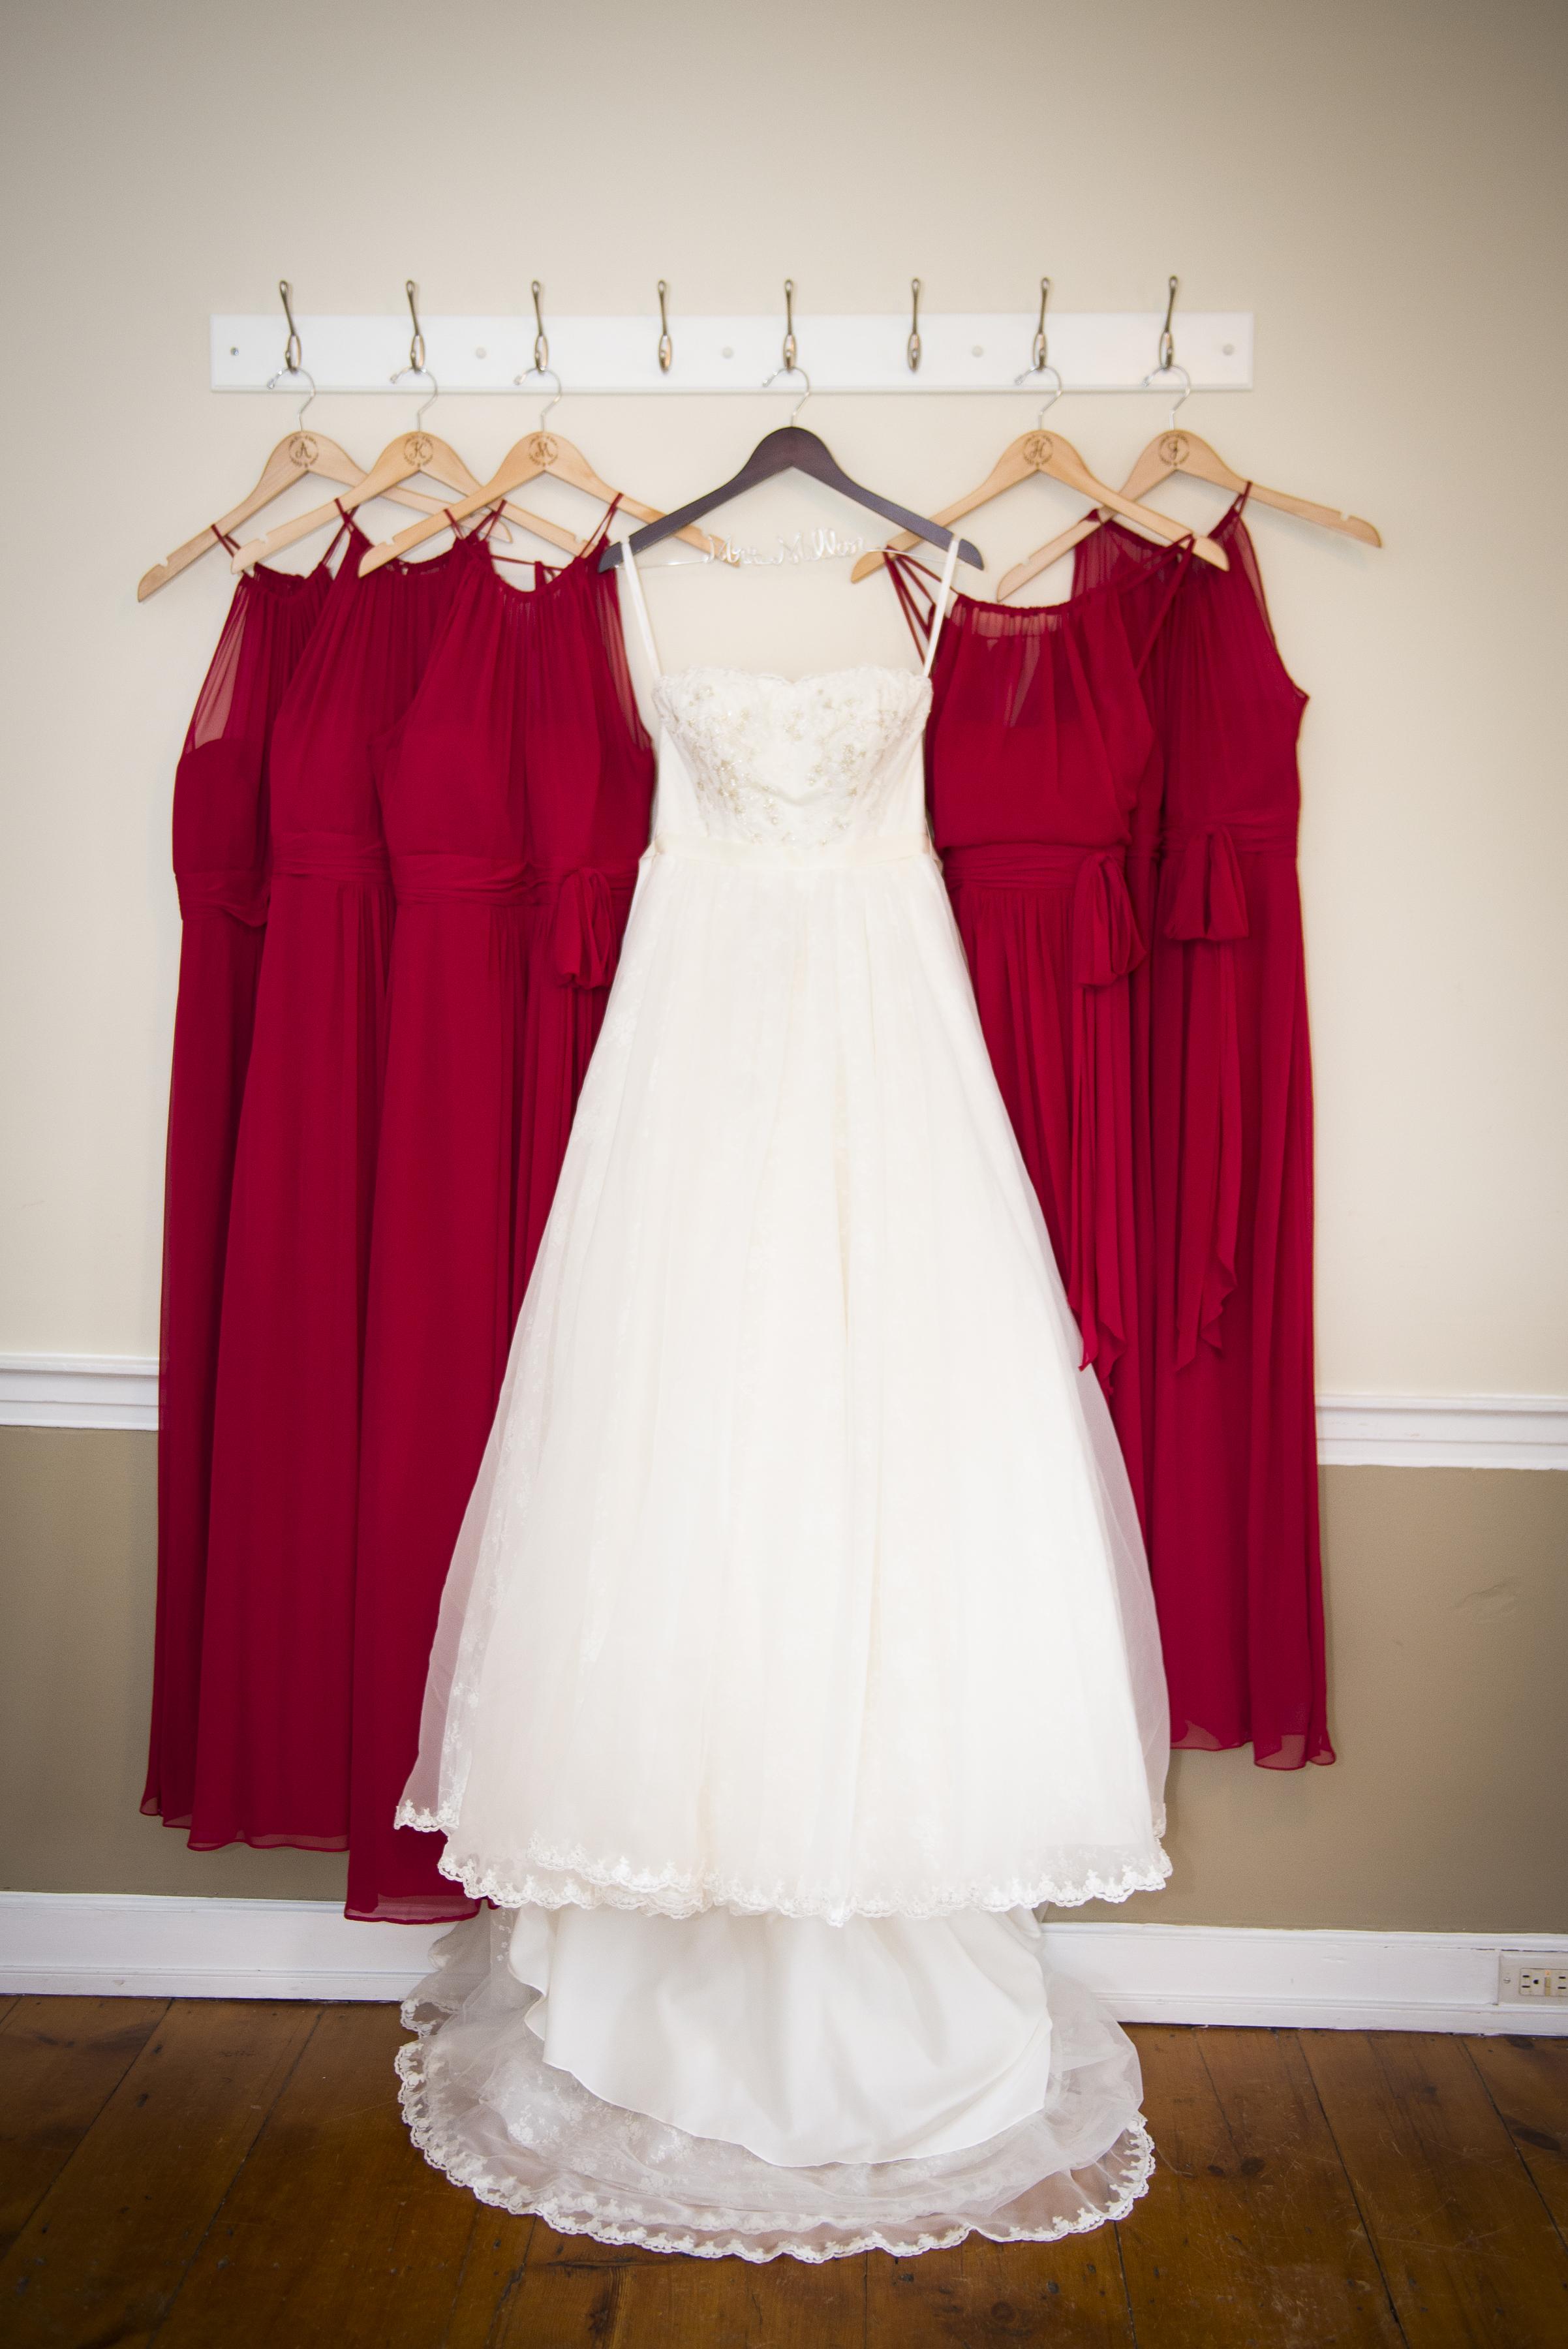 Cranberry bridesmaids dresses // The Miner Details weddings